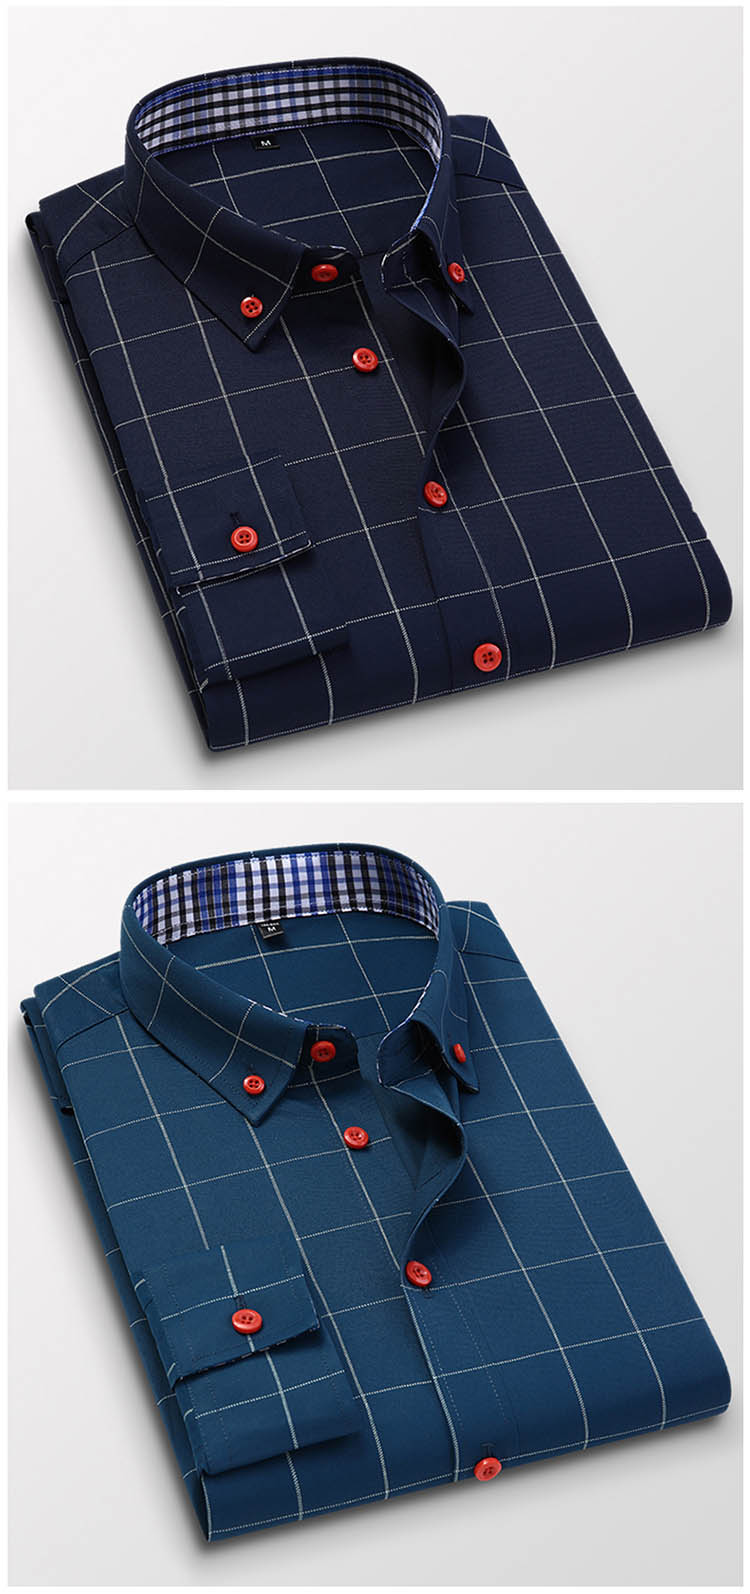 H8a473c5484a74bb09a43e7832fae499bp Handsome Fashion Men Shirts Casual Long Sleeved Plaid Shirt Regular Fit Male Blouse 4XL 5XL